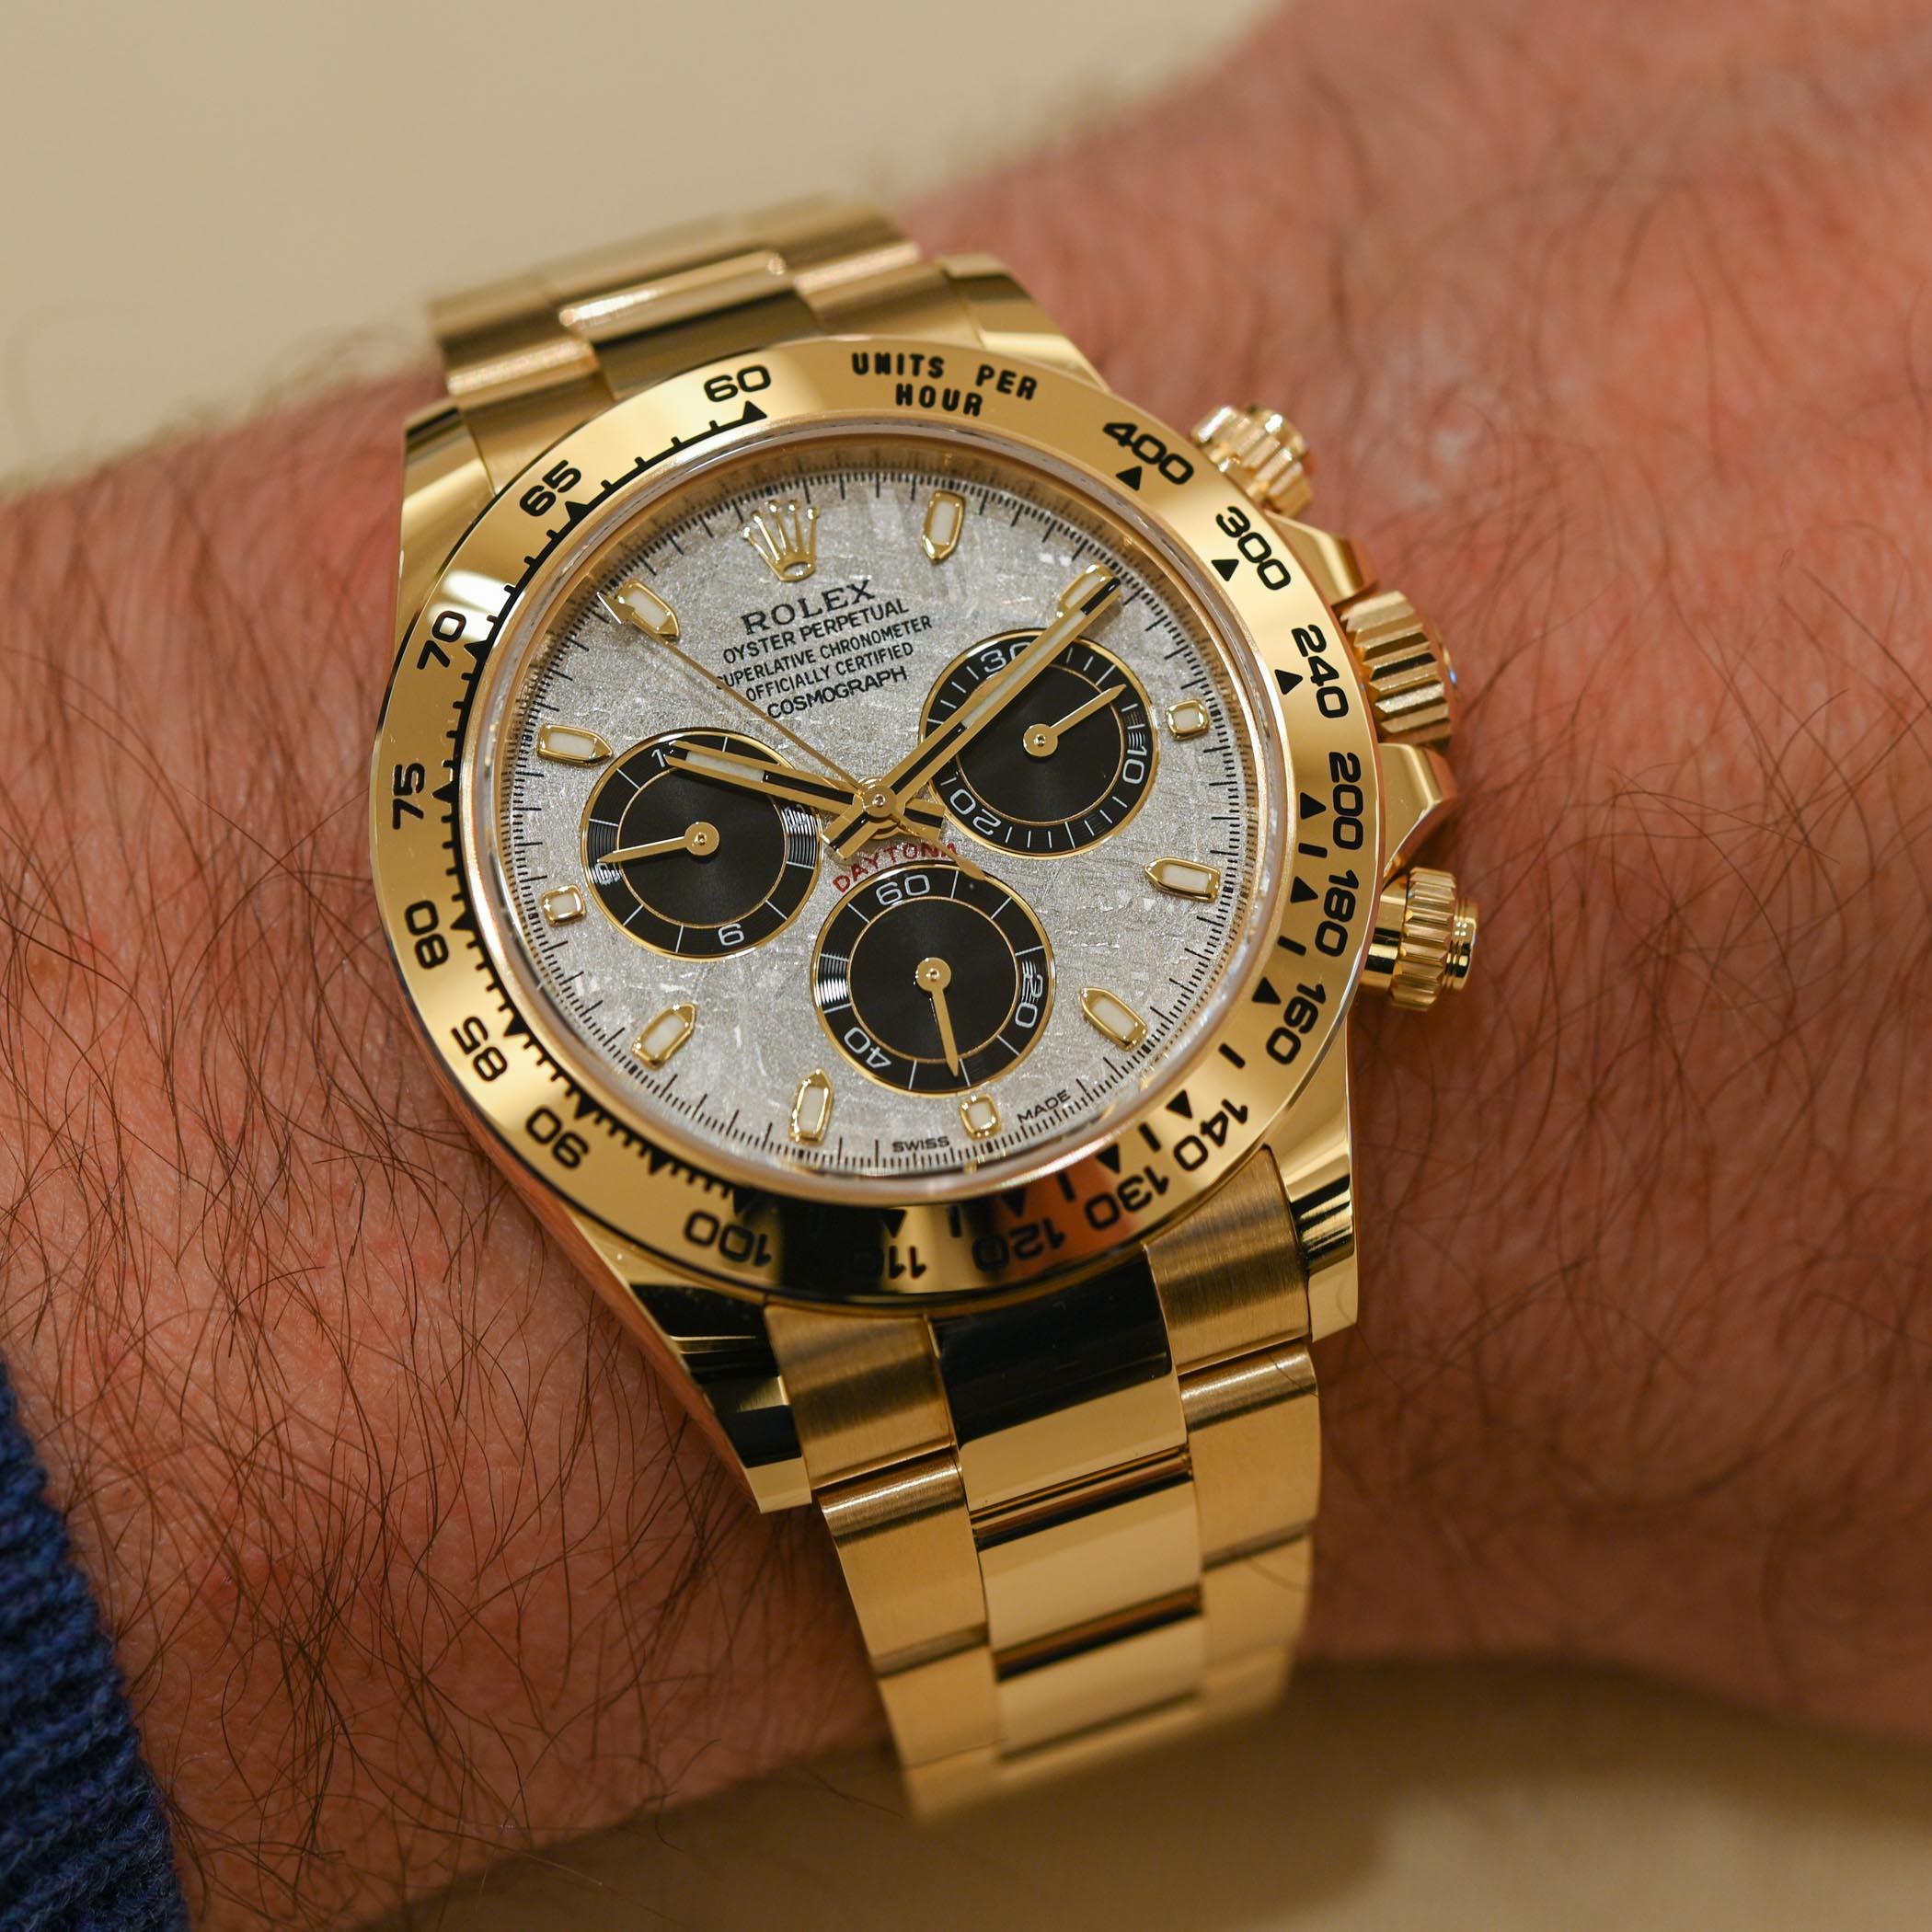 2021 Rolex Daytona meteorite panda dial yellow gold M116508-0015